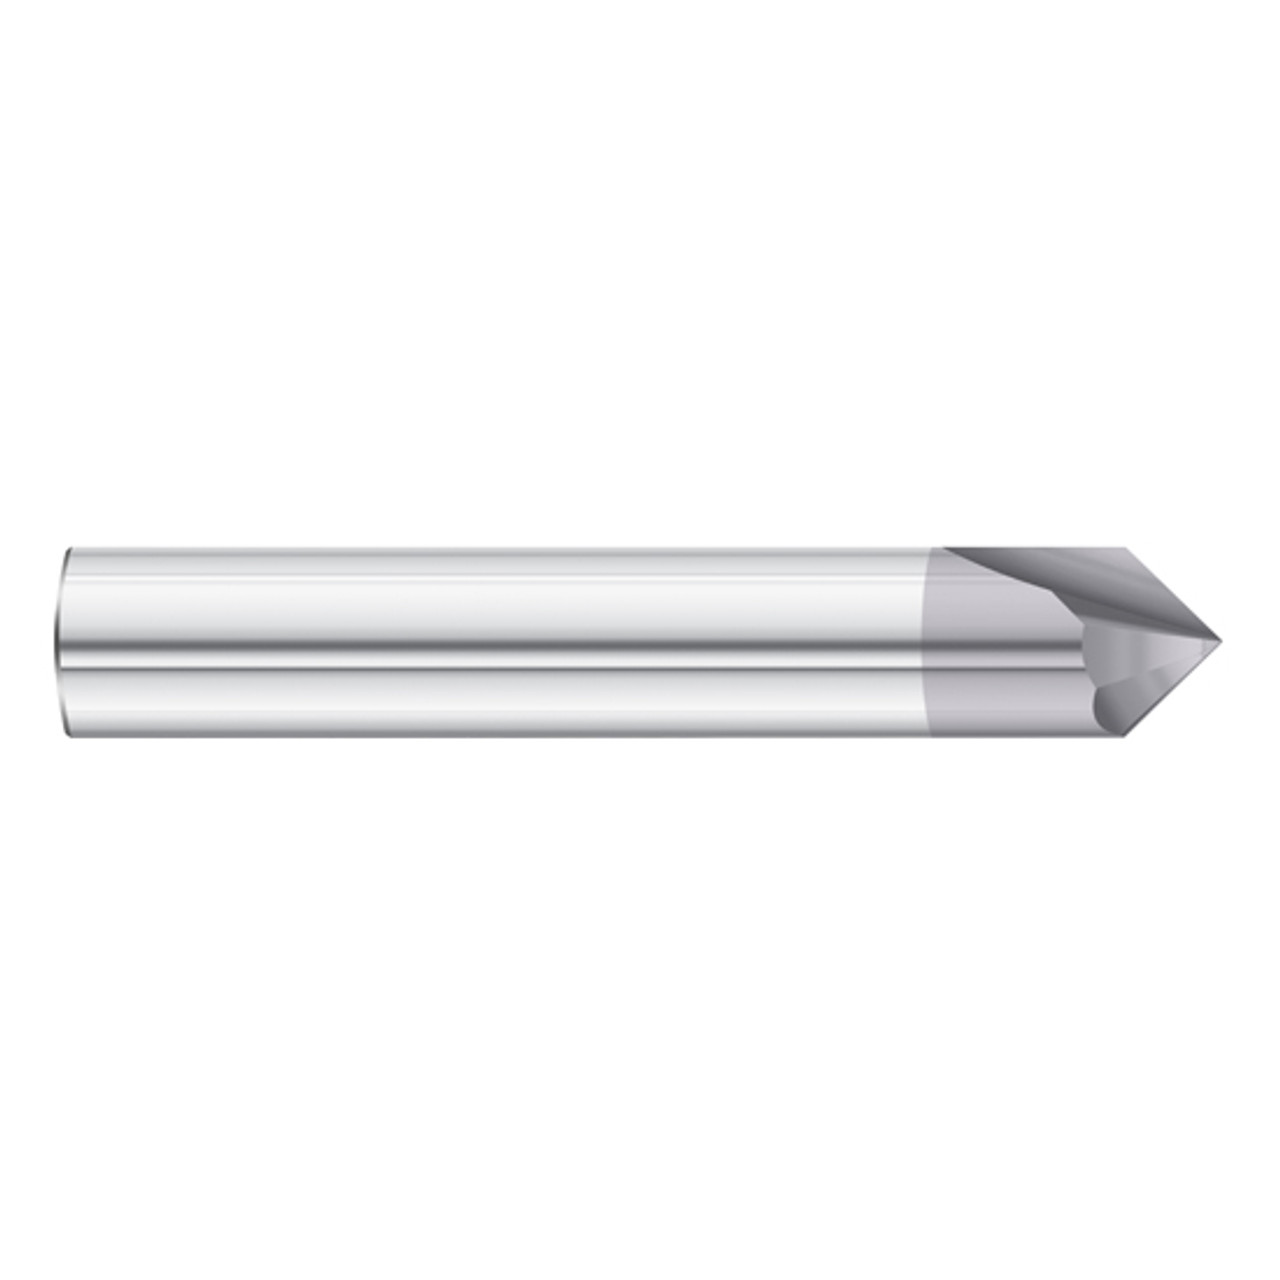 Fullerton Tool 35200 3//16 Diameter x 3//16 Shank x 3//4 LOC x 2-1//2 OAL 4 Flute FC20 Solid Carbide Radius End Mill